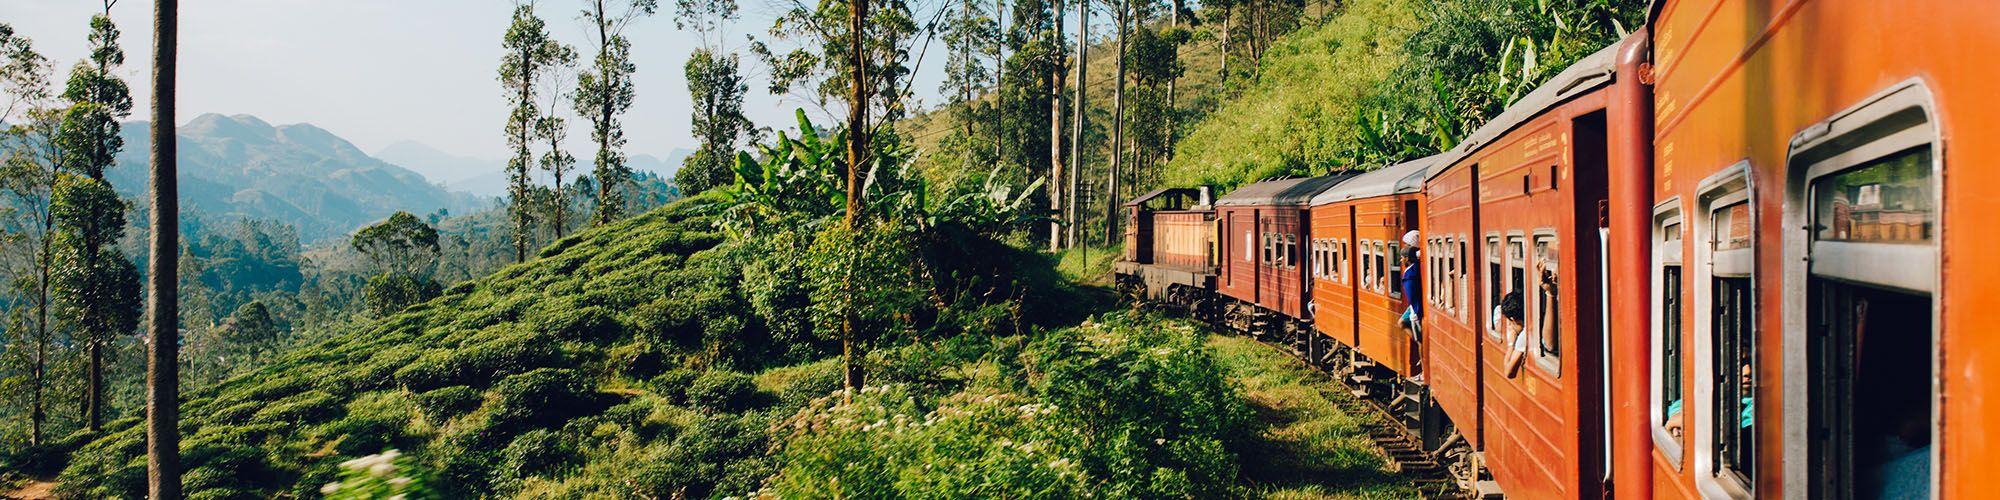 Sri Lanka, Zugfahrt, Berge